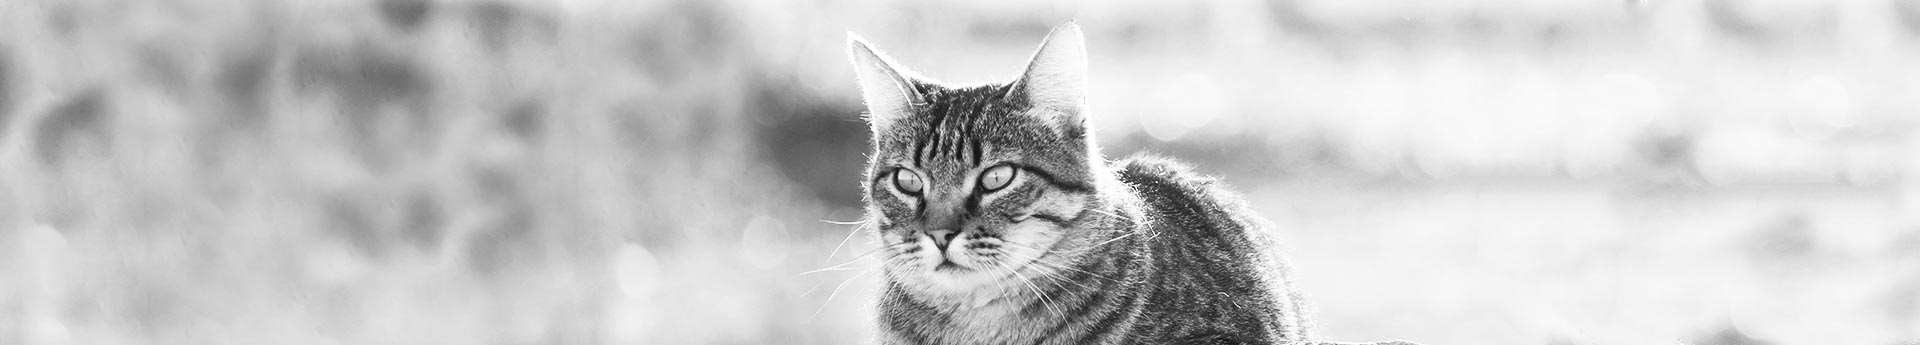 ORIJEN Tundra Dry Cat Food - Striped cat staring intently - Dante in Shelly, Idaho